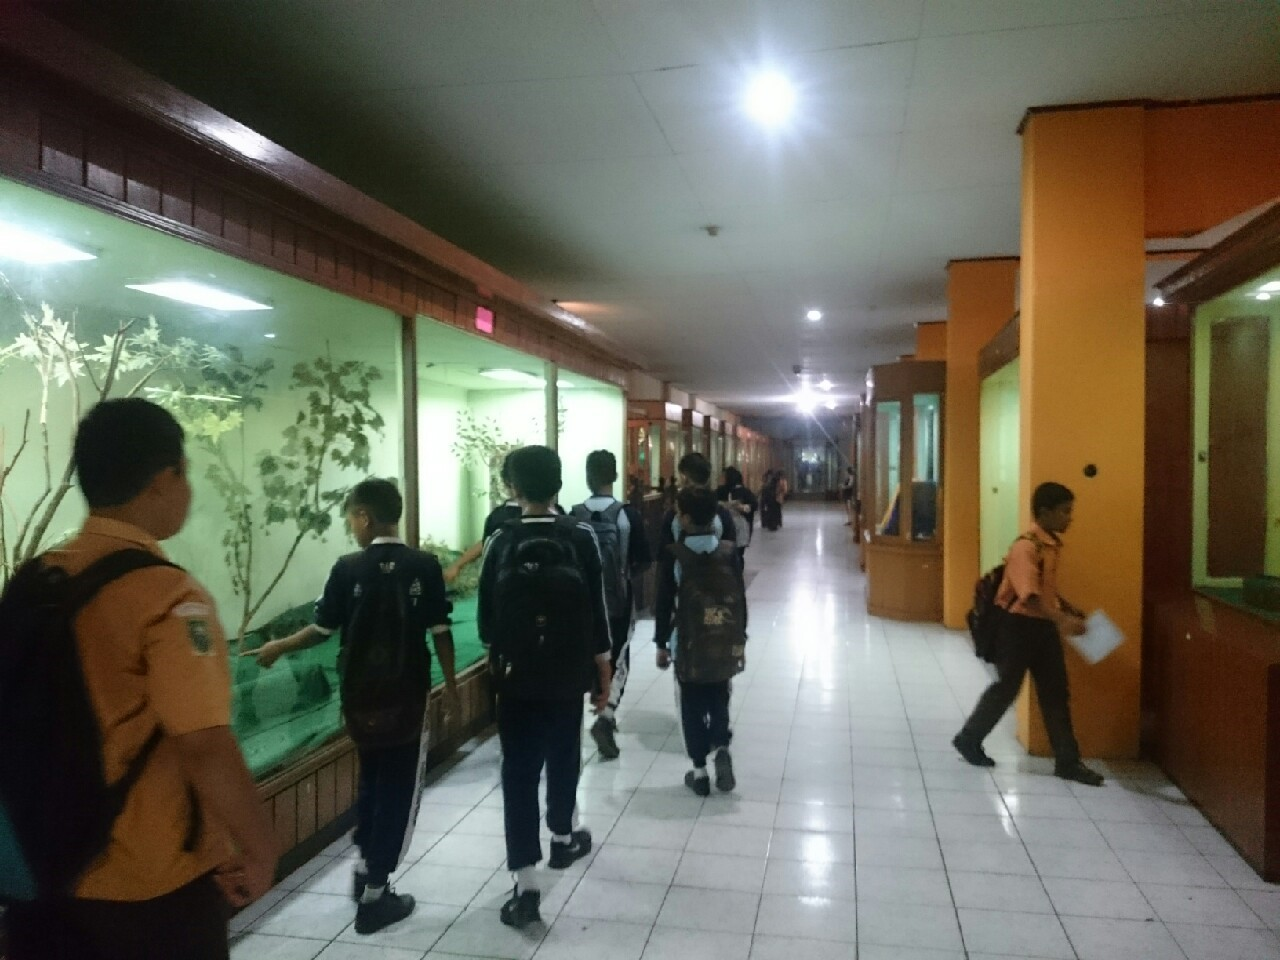 Pameran Museum Nila Utama Menarik Minat Pengunjung Pihak Mengundang Sekolah